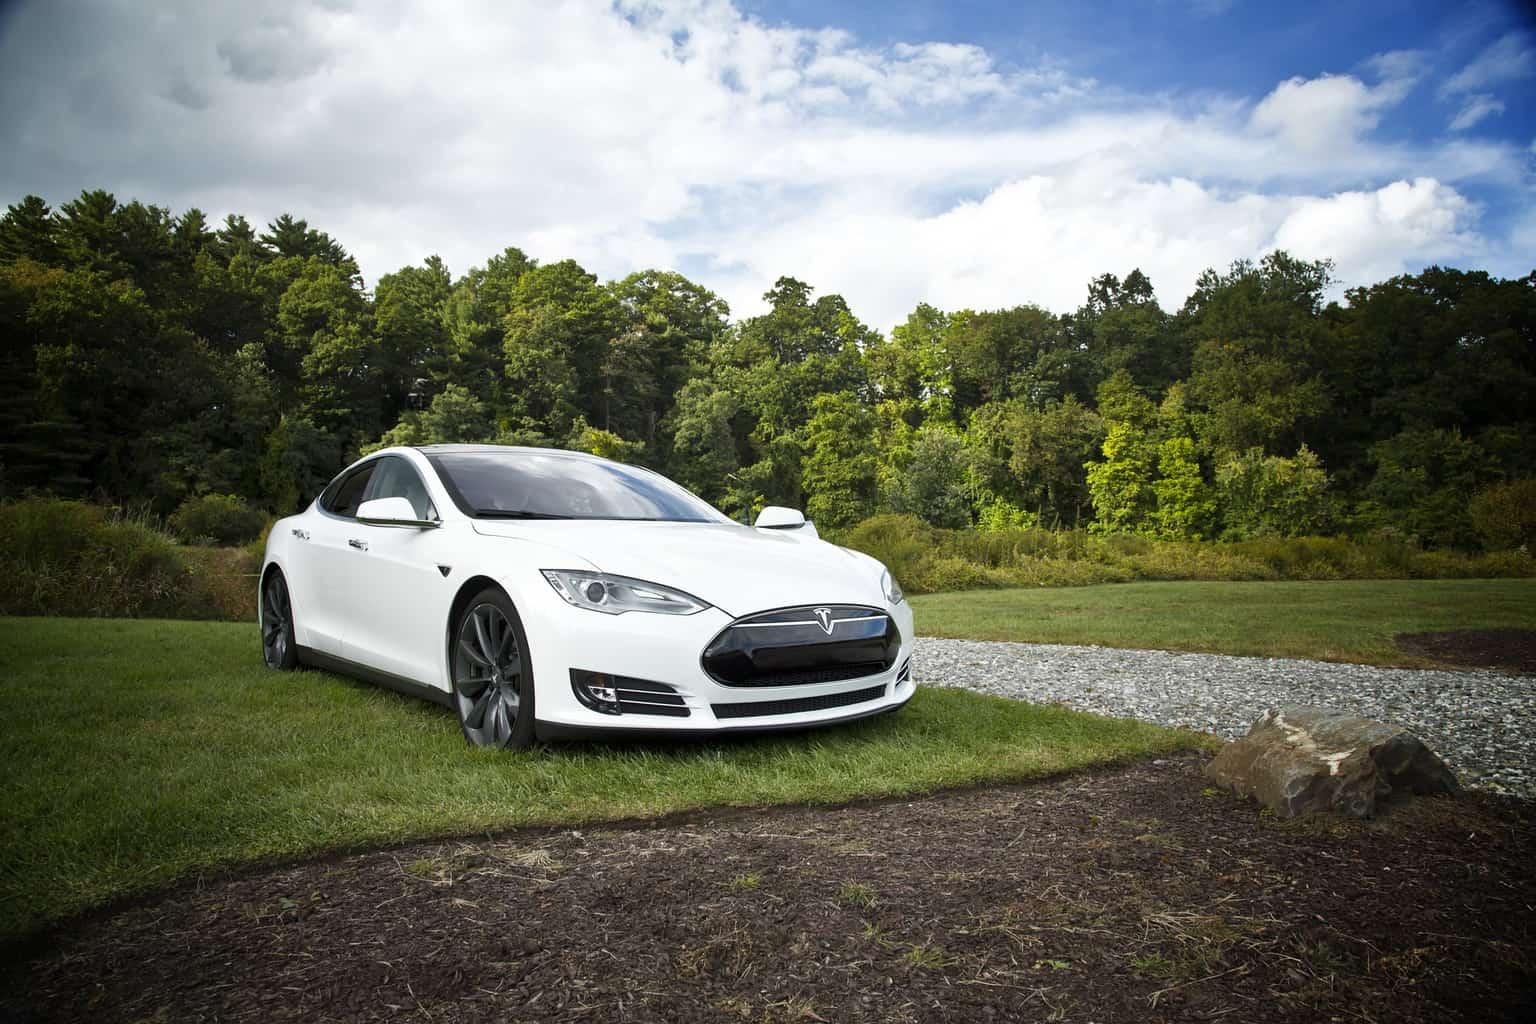 Une Tesla blanche